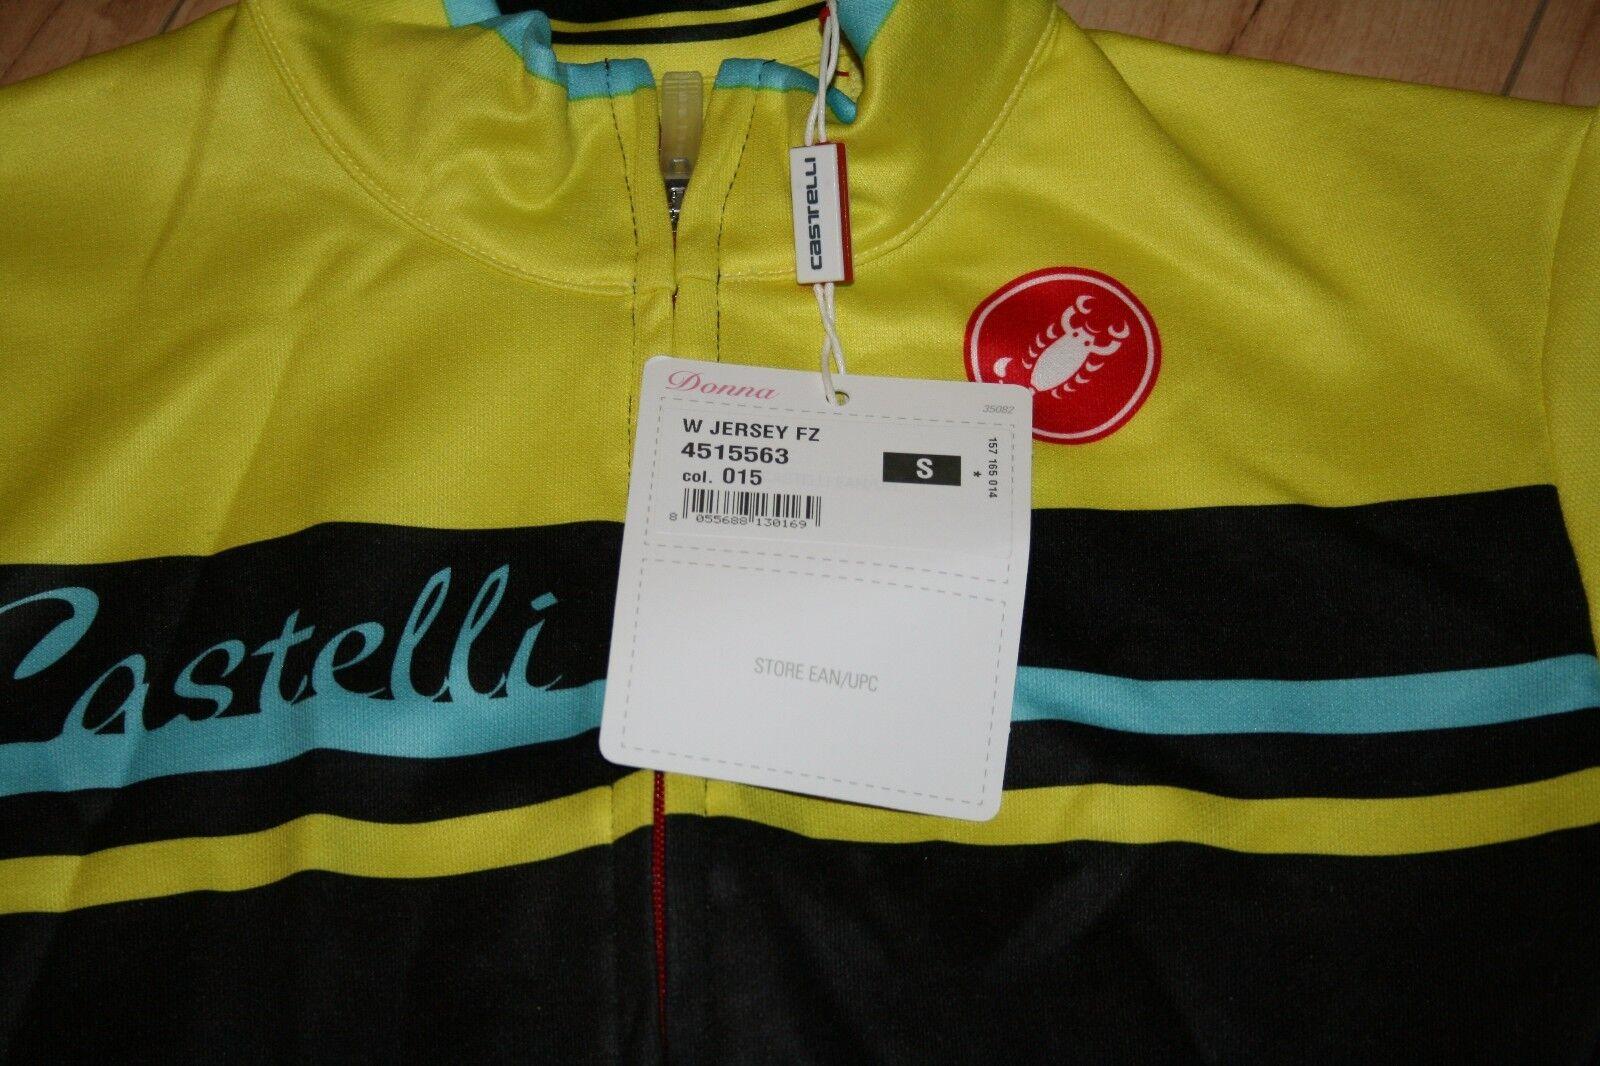 Castelli Girone Jersey FZ - Women's S Small